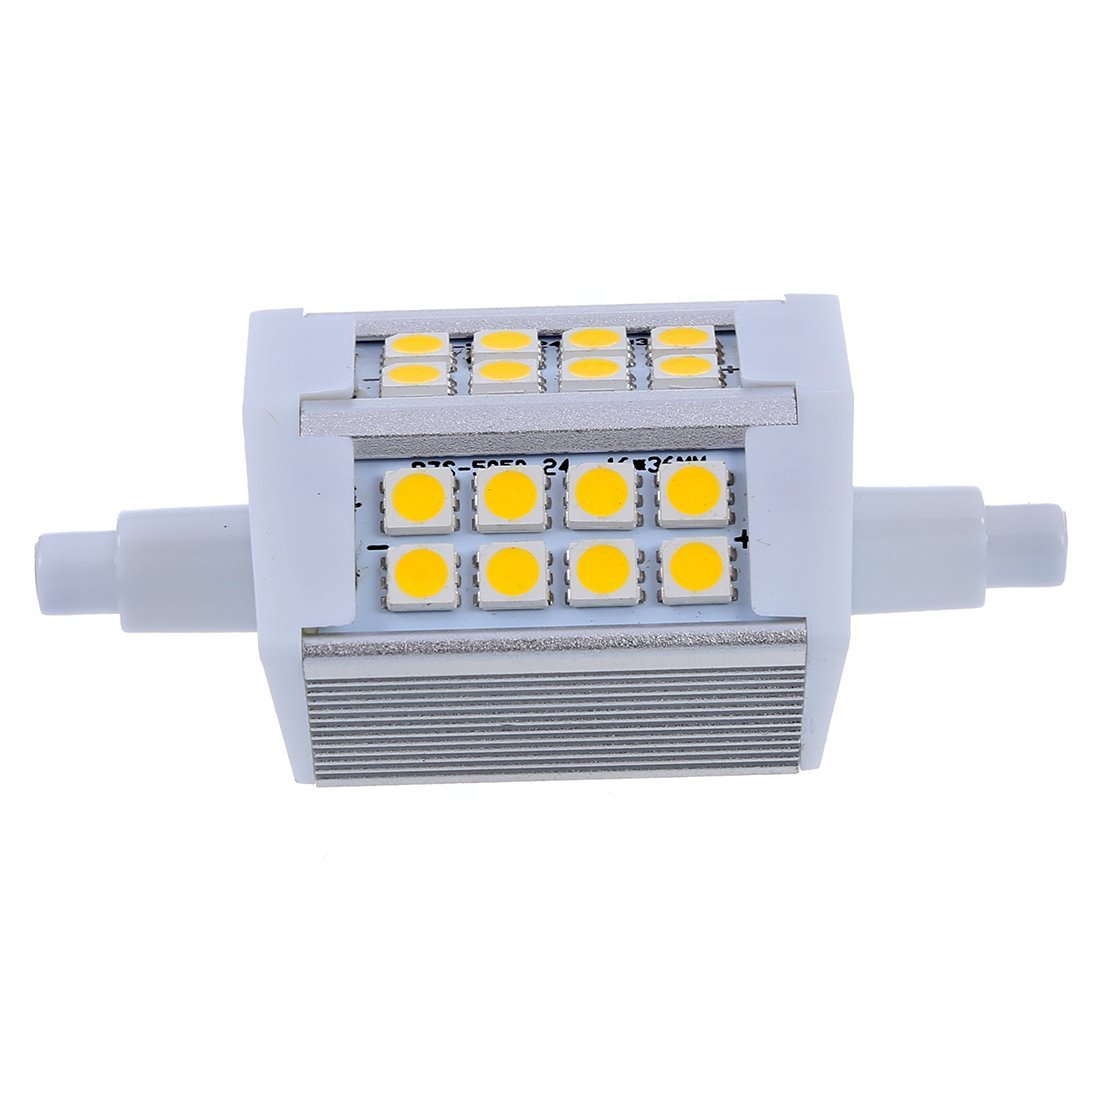 TOOGOO(R) R7S J118 5W 24 5050 SMD LED 78mm Flood Light Lamp Bulb 85-265V Warm